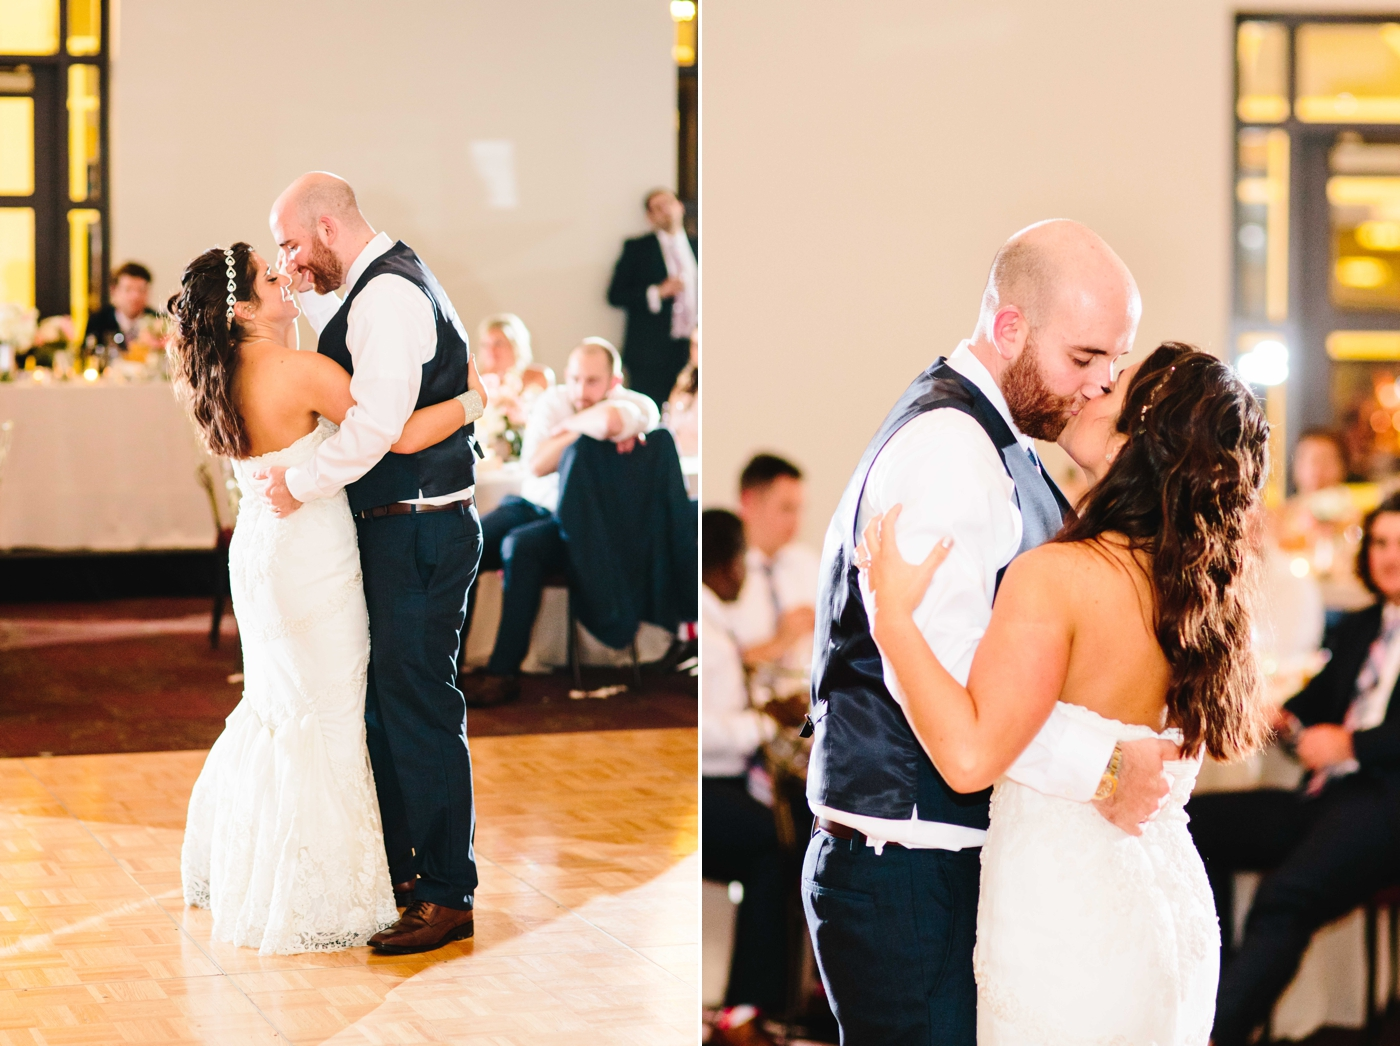 chicago-fine-art-wedding-photography-svihra24